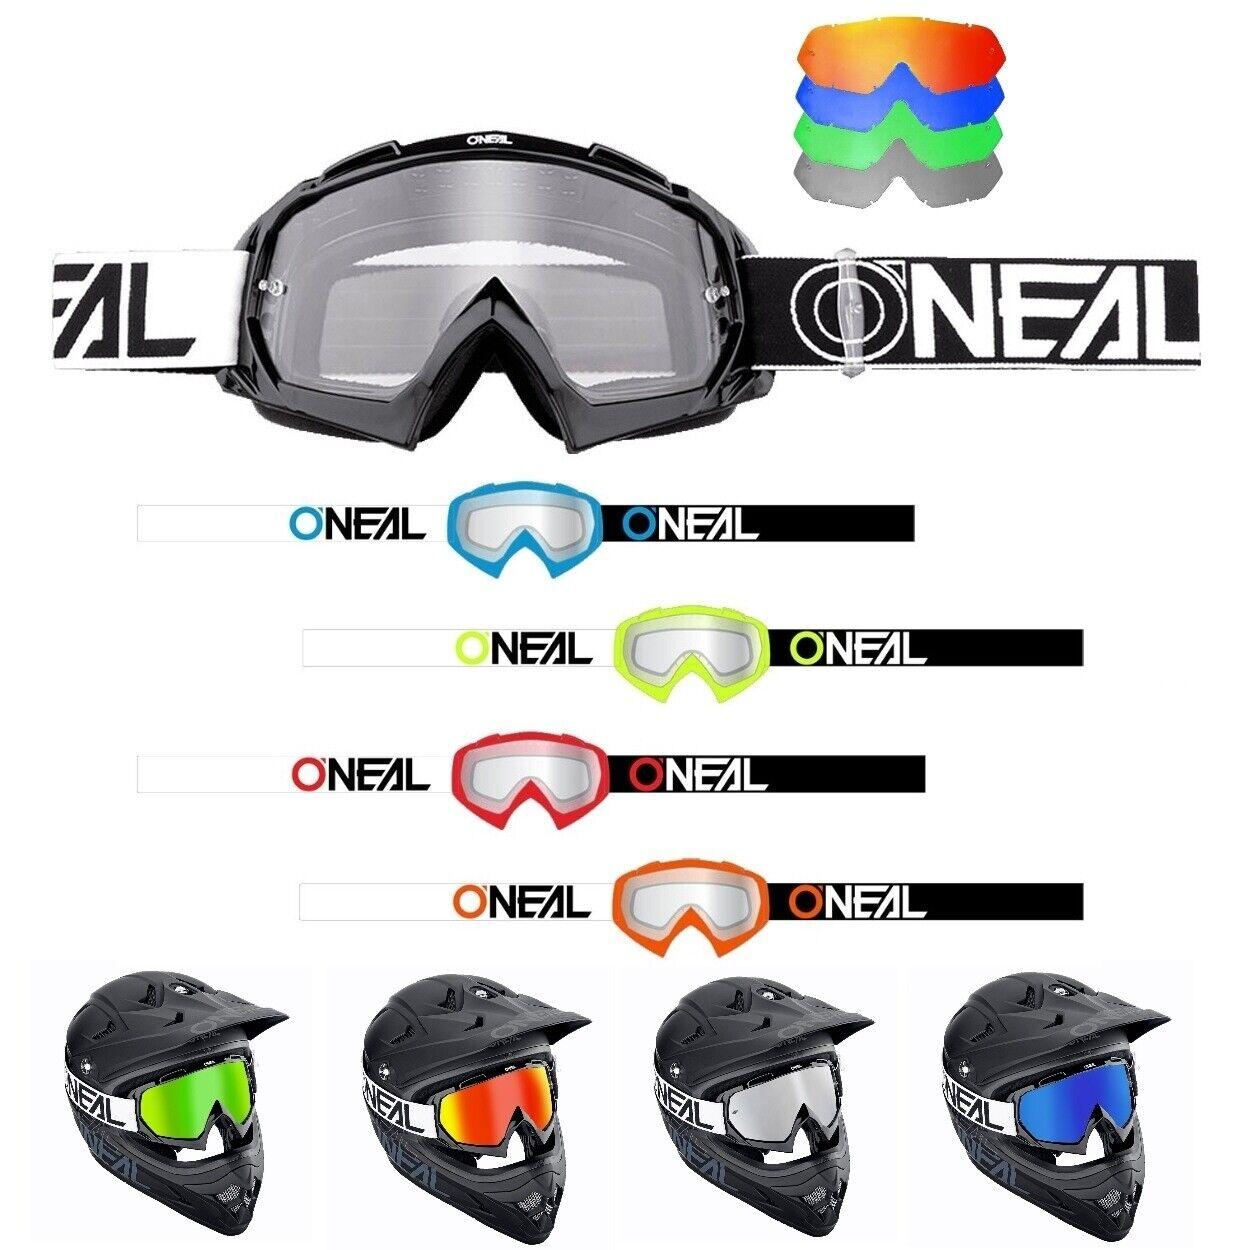 Oneal B-10 TWOFACE MX MX MX Enduro Crossbrille verspiegelt blau rot grün ff8d39